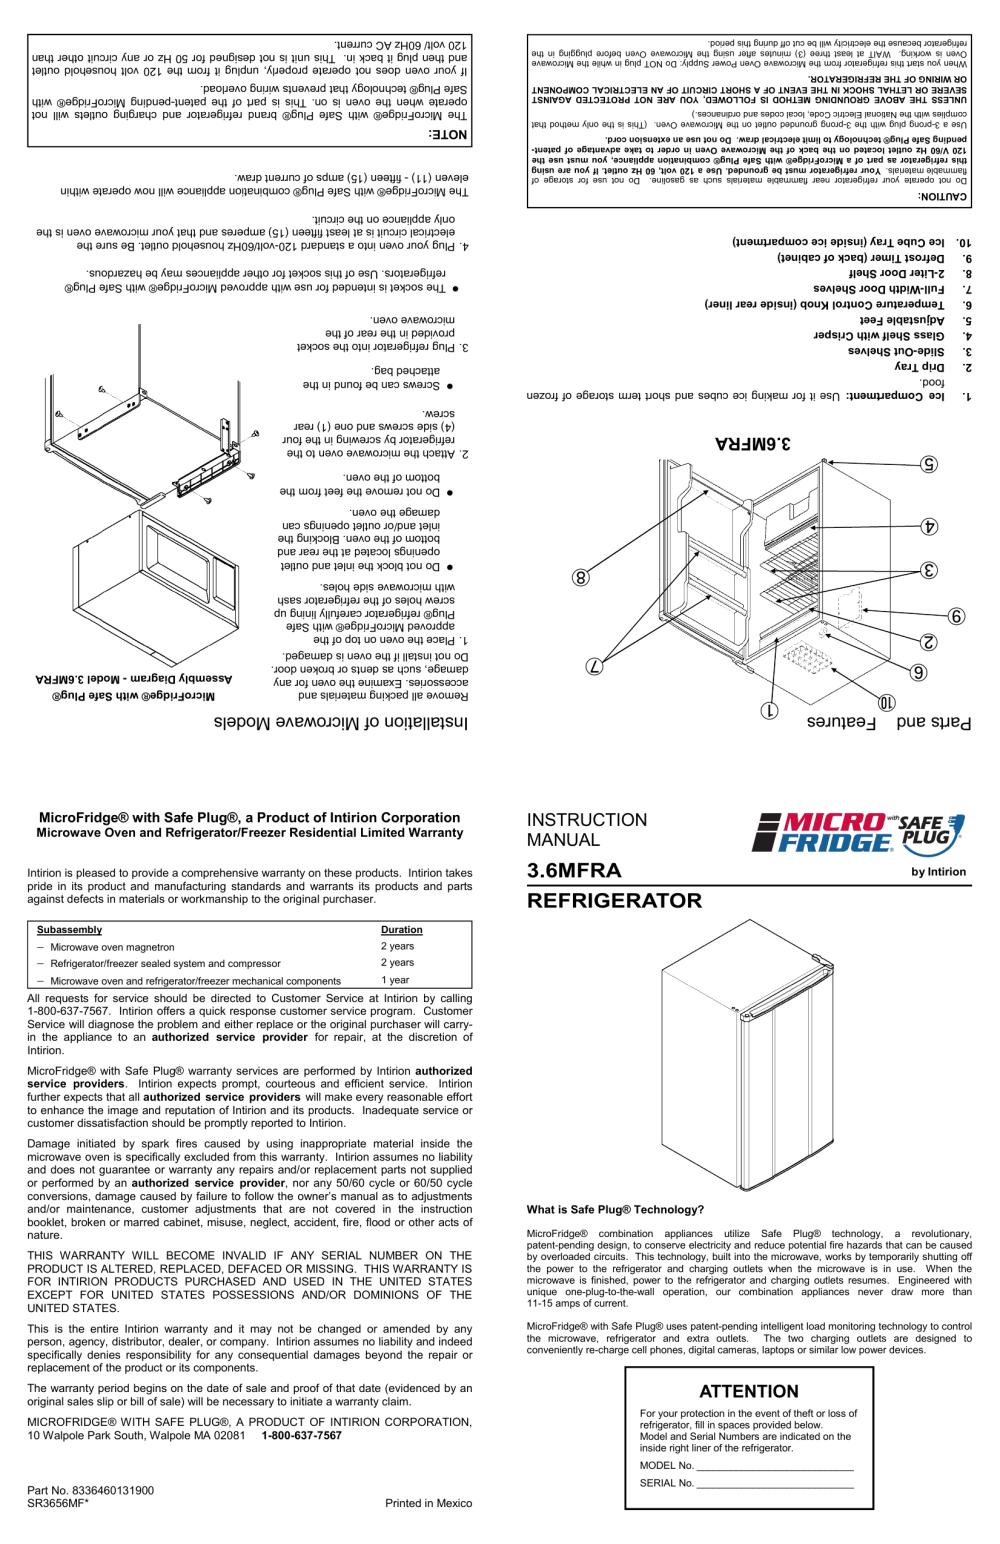 medium resolution of microfridge 3 6mf4a 7d1w instruction manual refrigerator